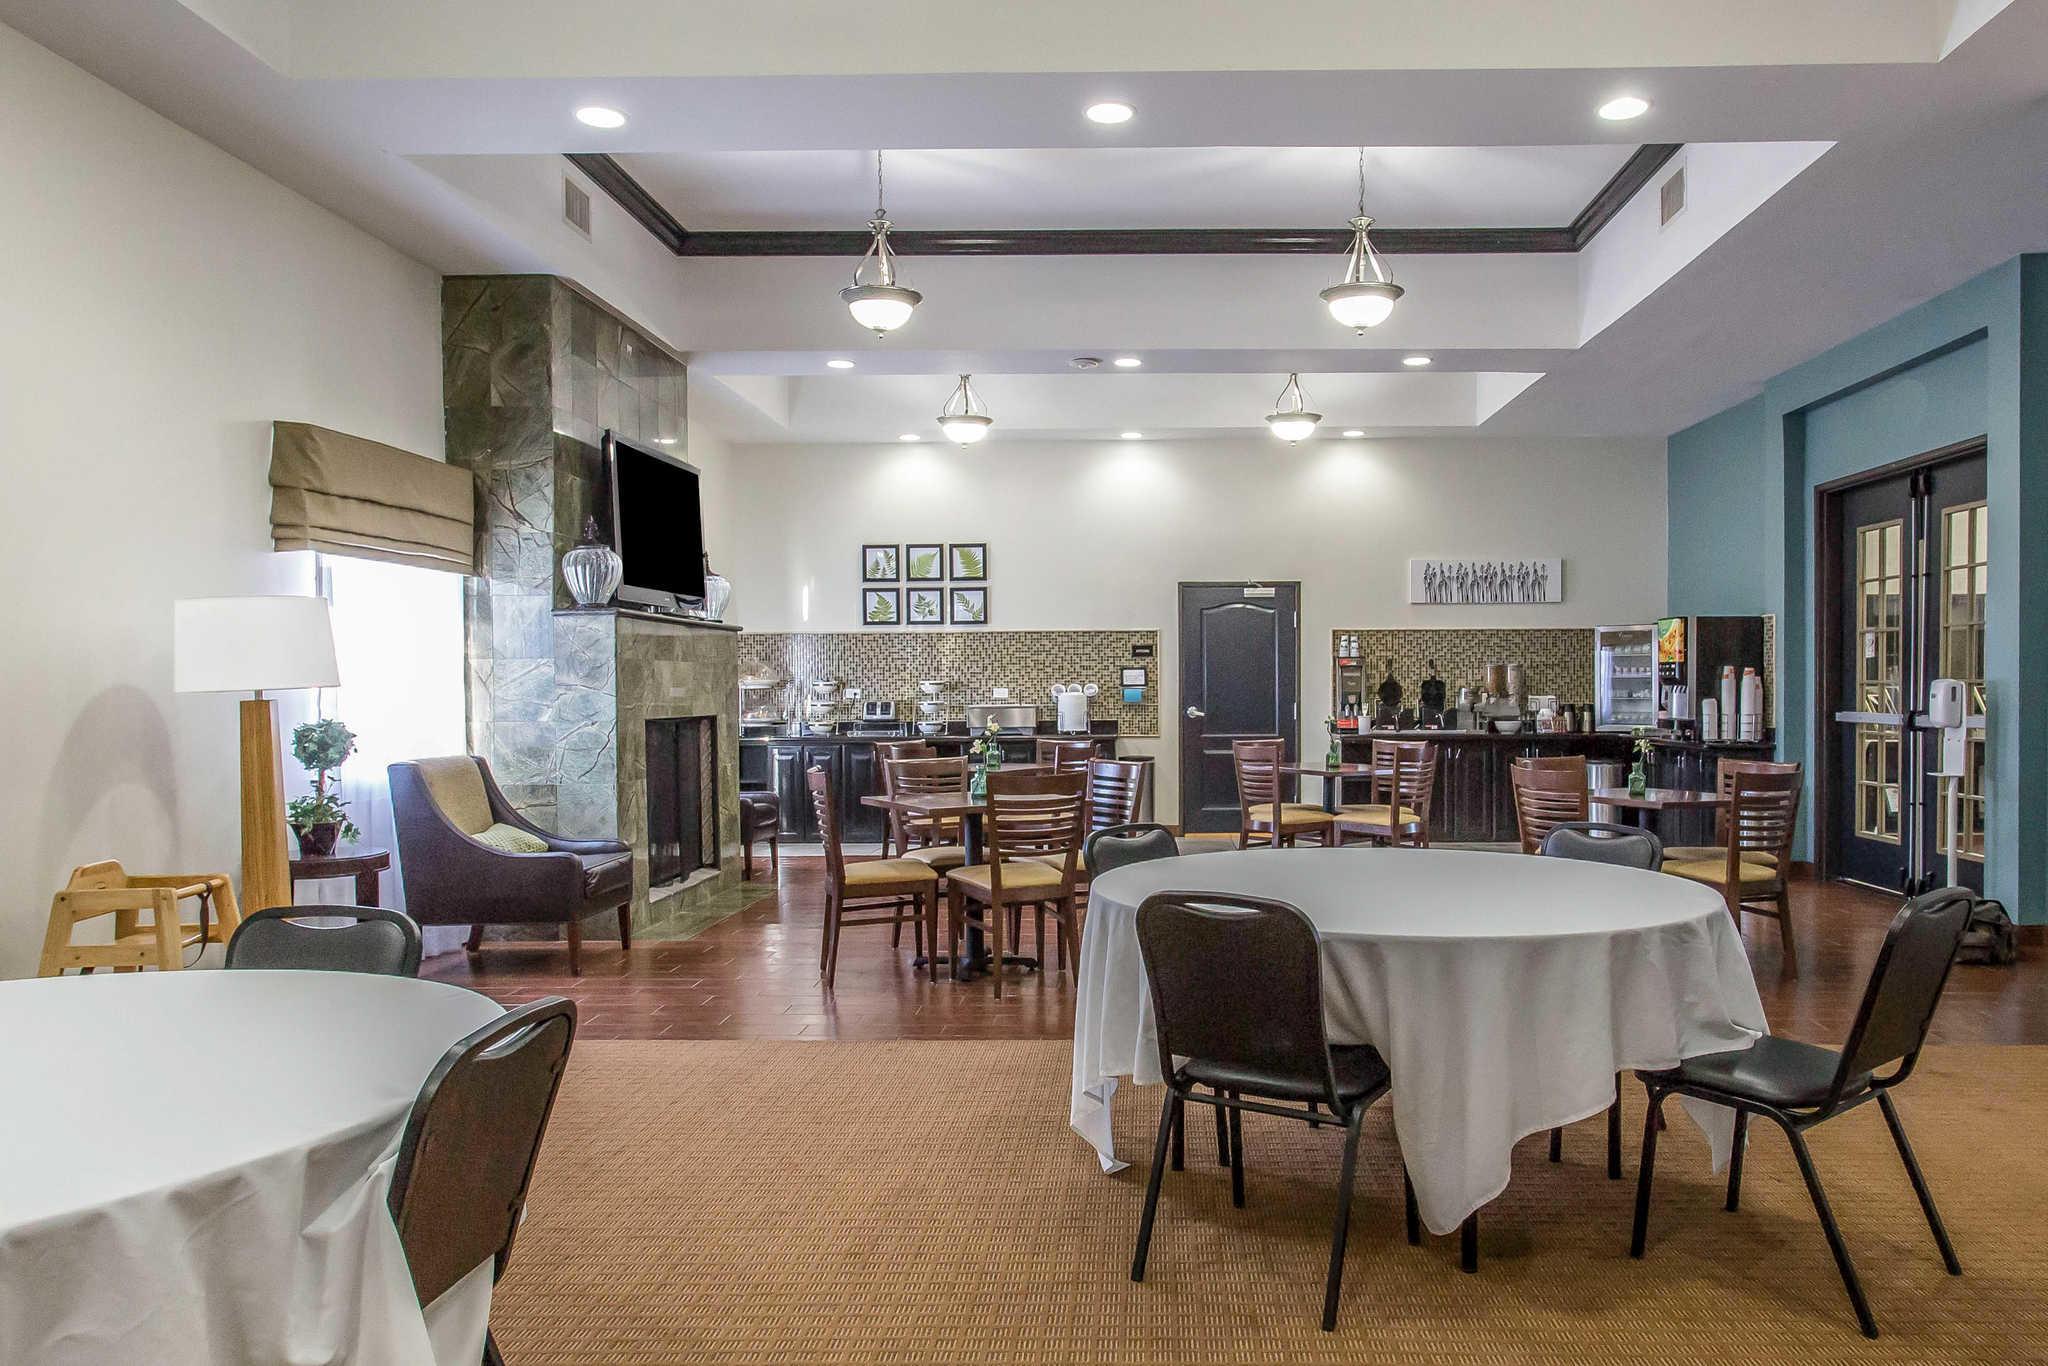 Sleep Inn & Suites West Medical Center image 21